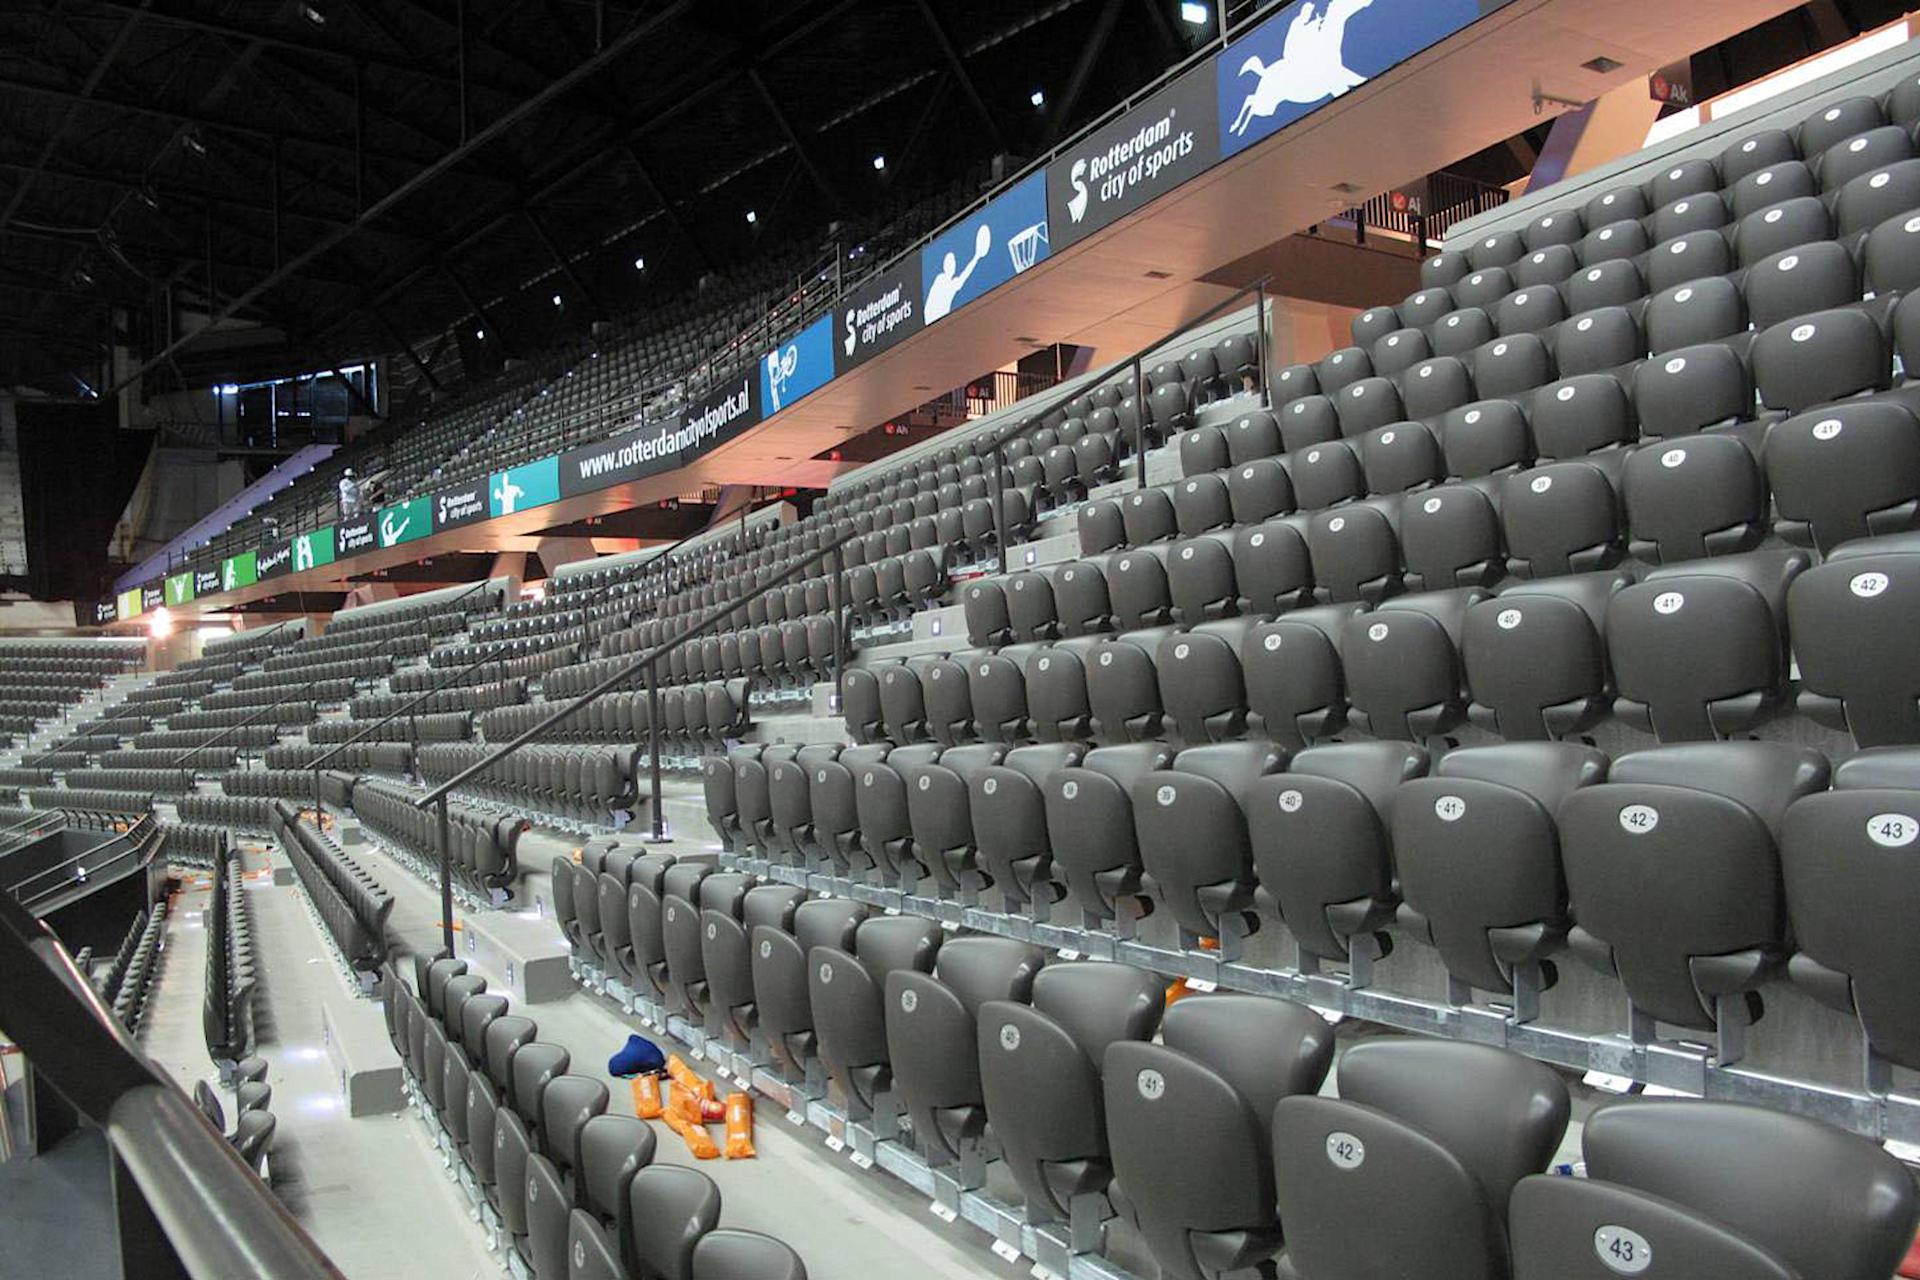 nl_rotterdam_ahoy_arena_04_web1